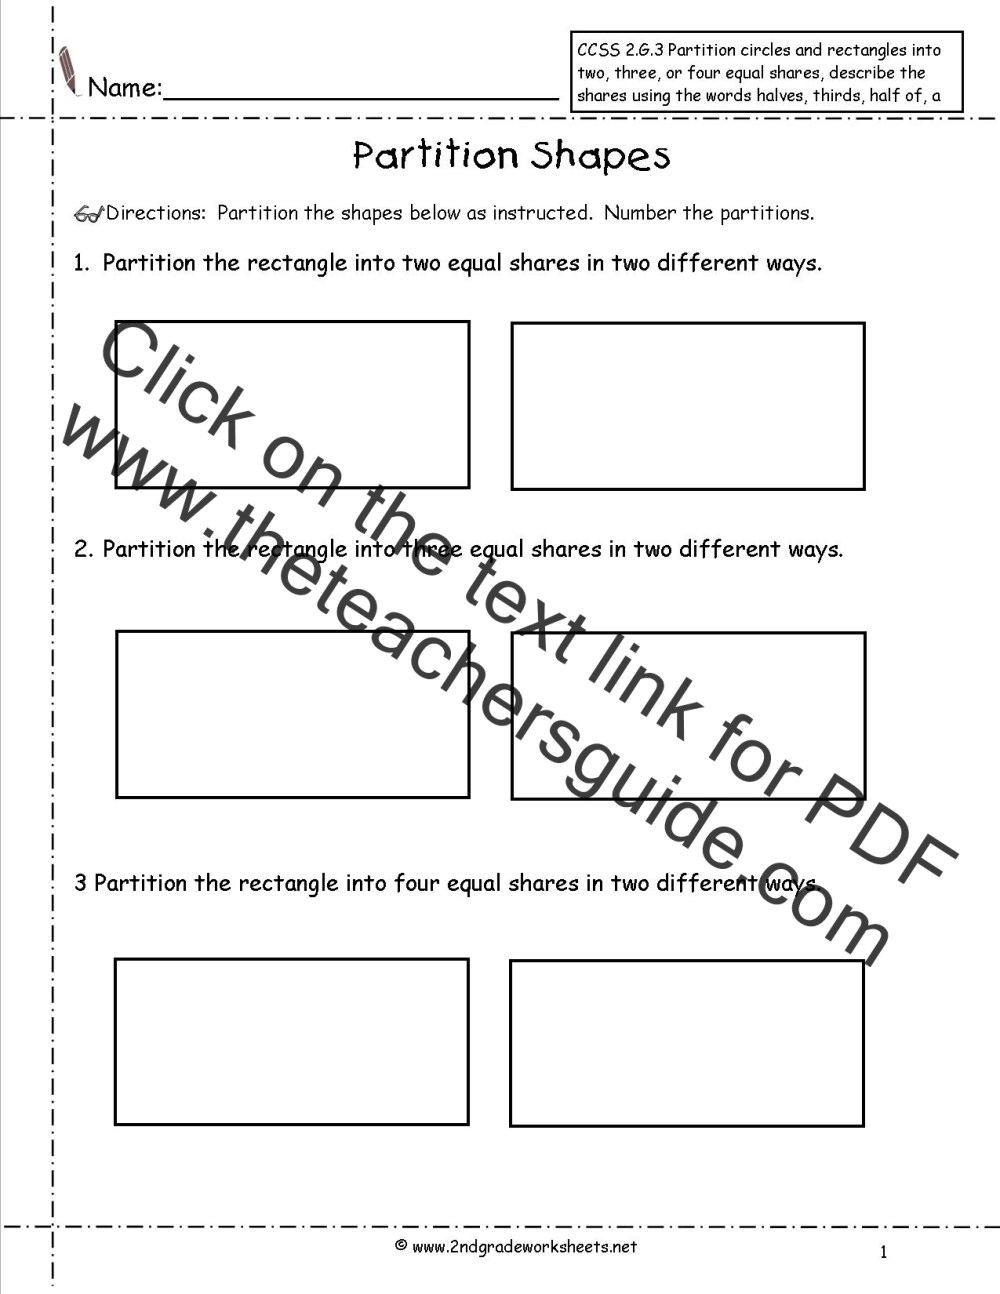 medium resolution of CCSS 2.G.3 Worksheets